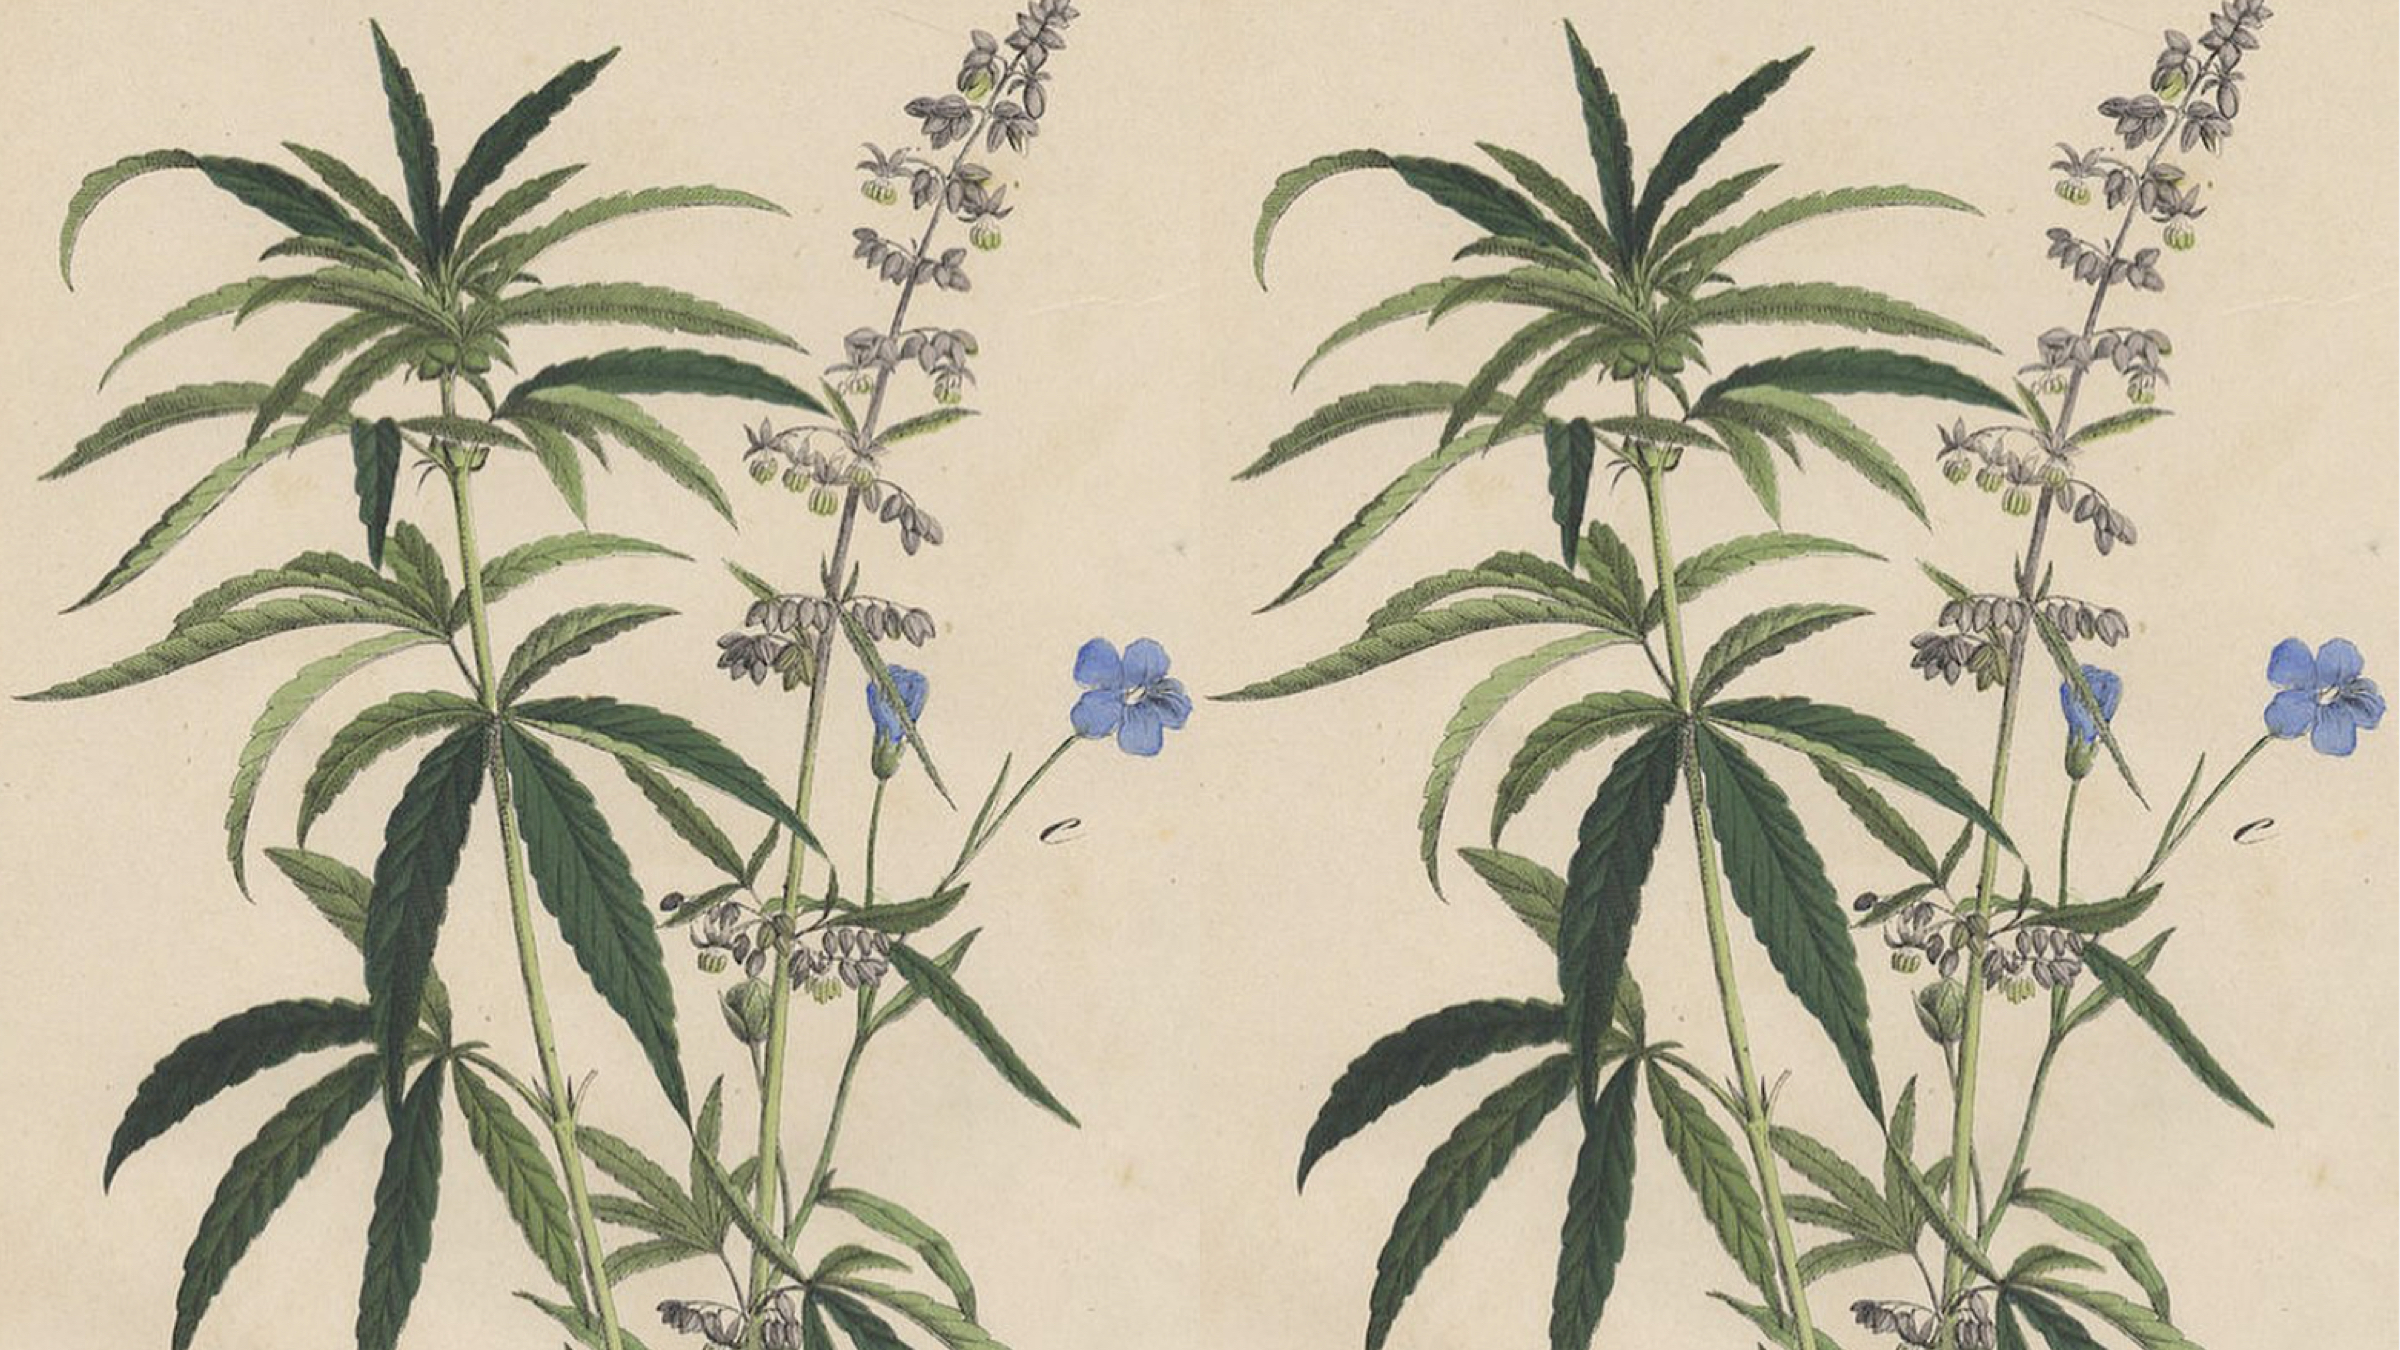 The Healing Way of Looking at Weed